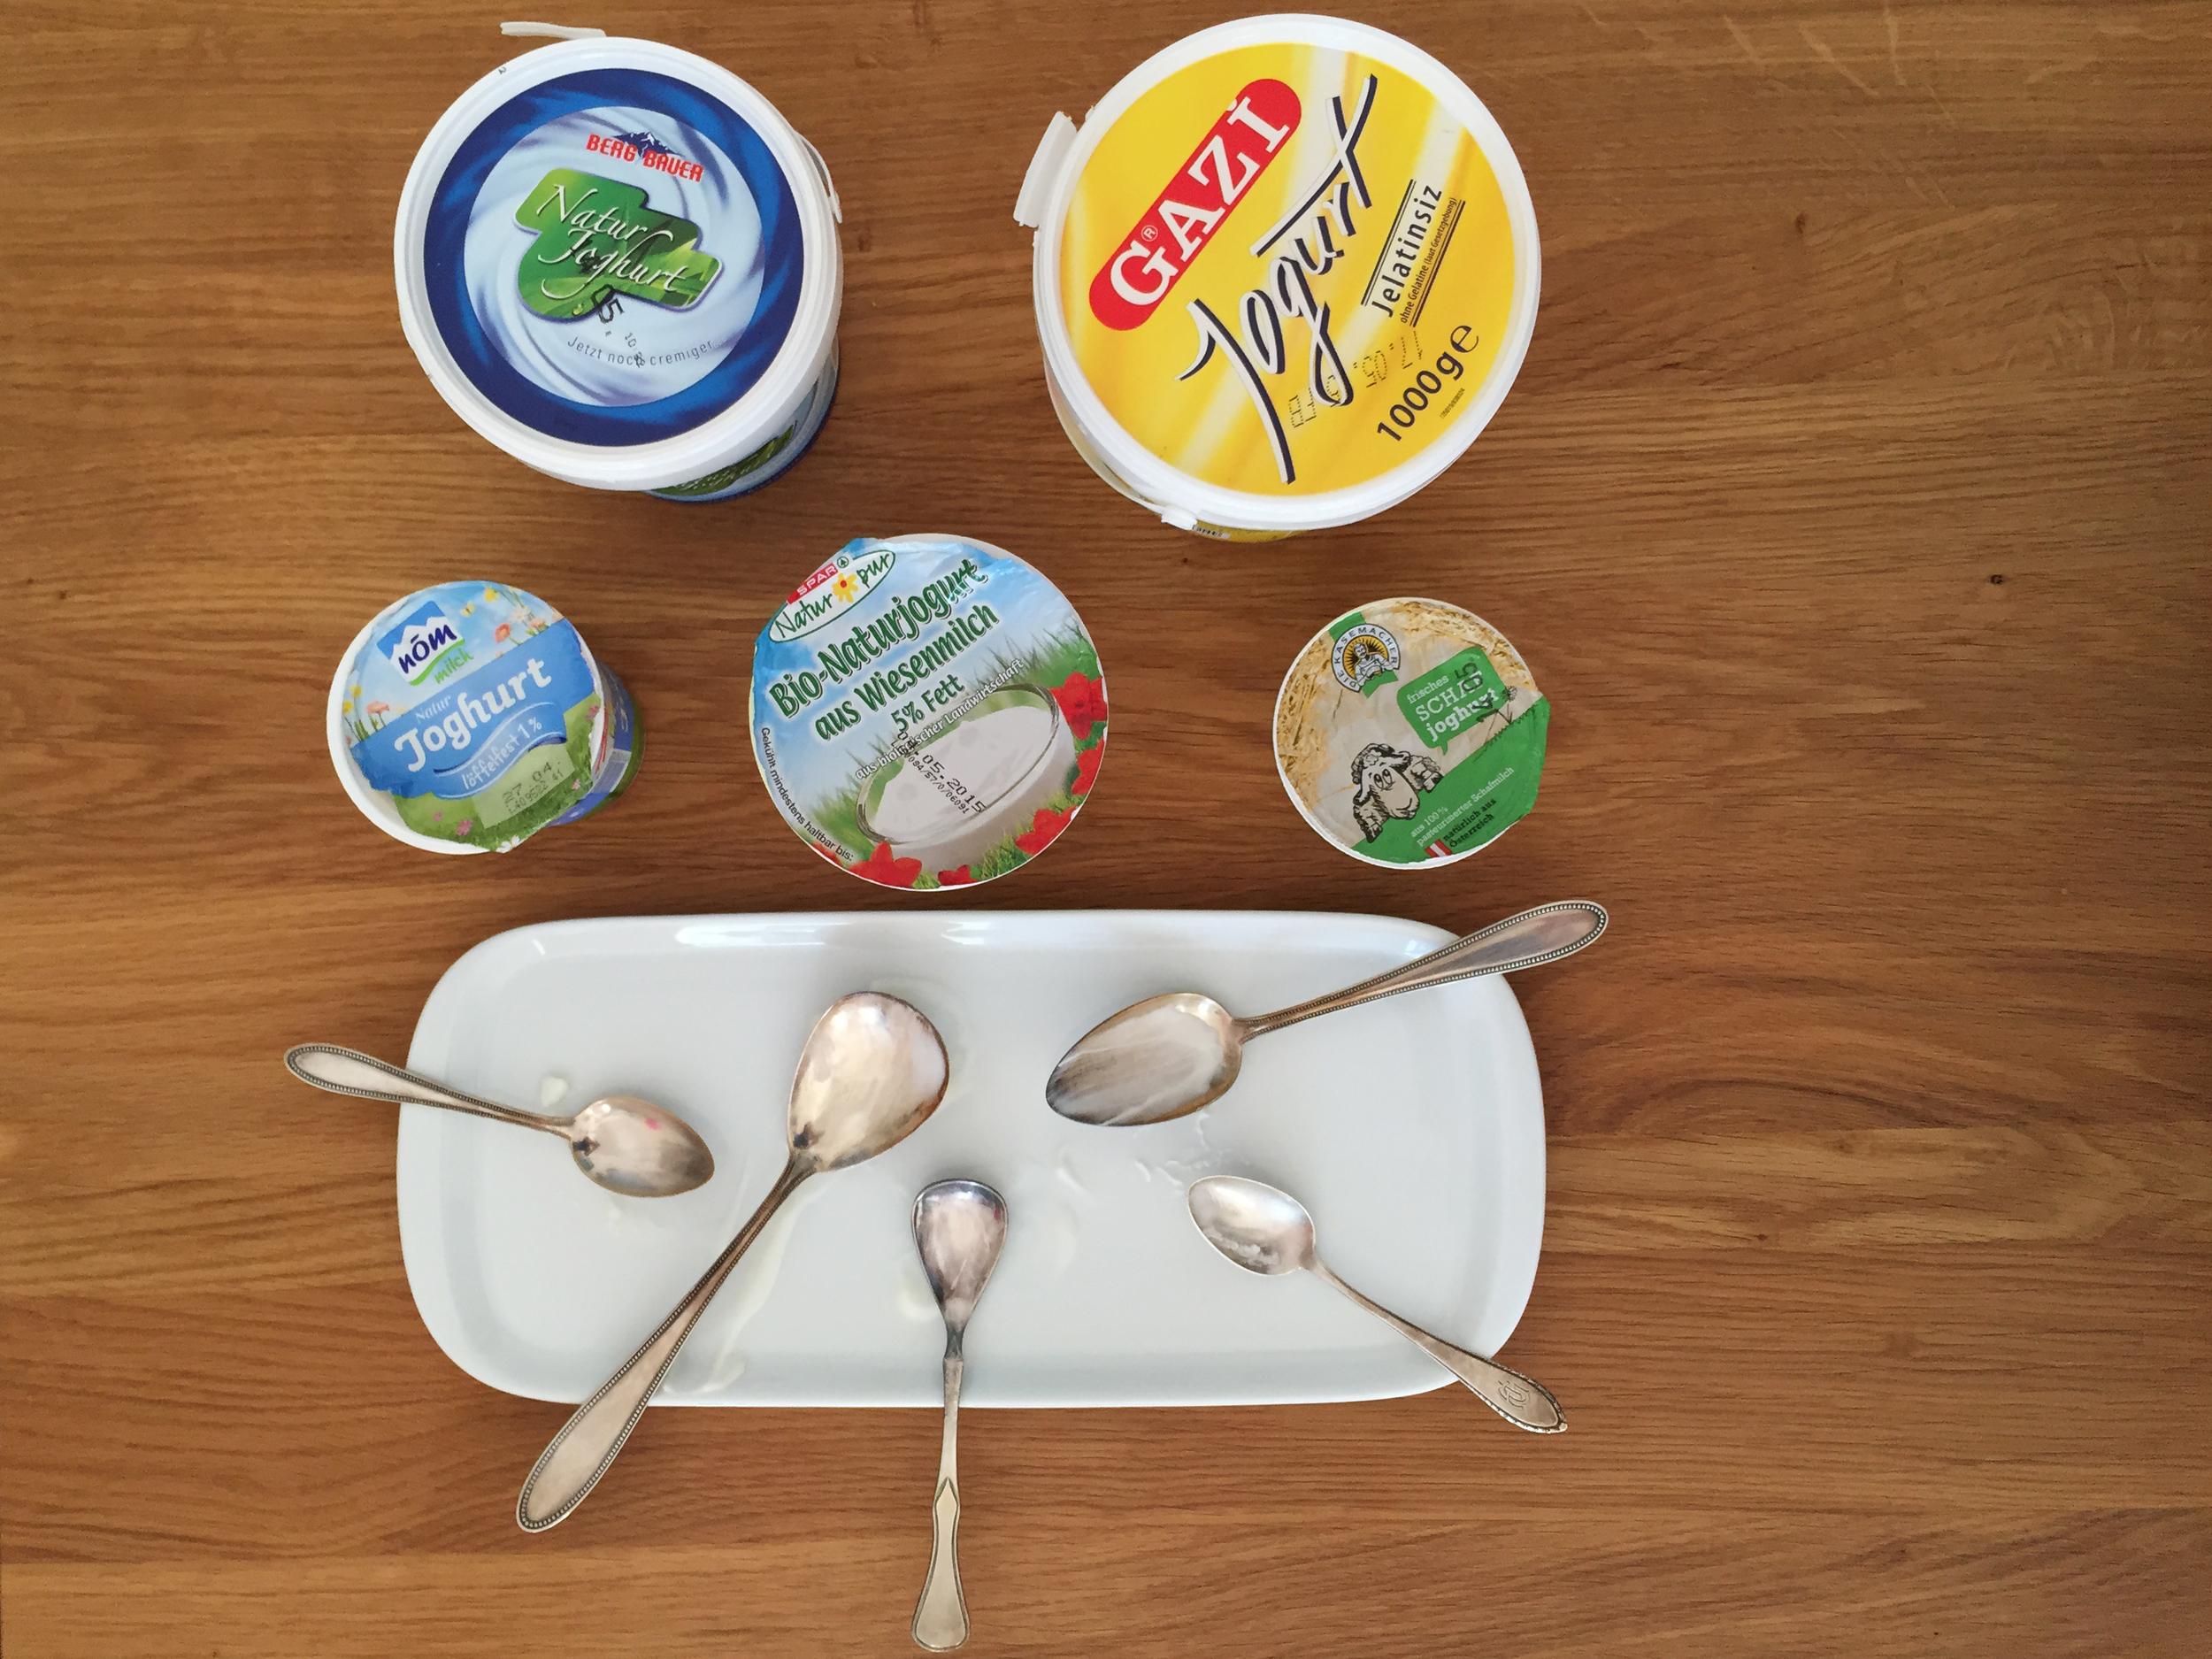 Austrian Yogurt Taste Test (Before)